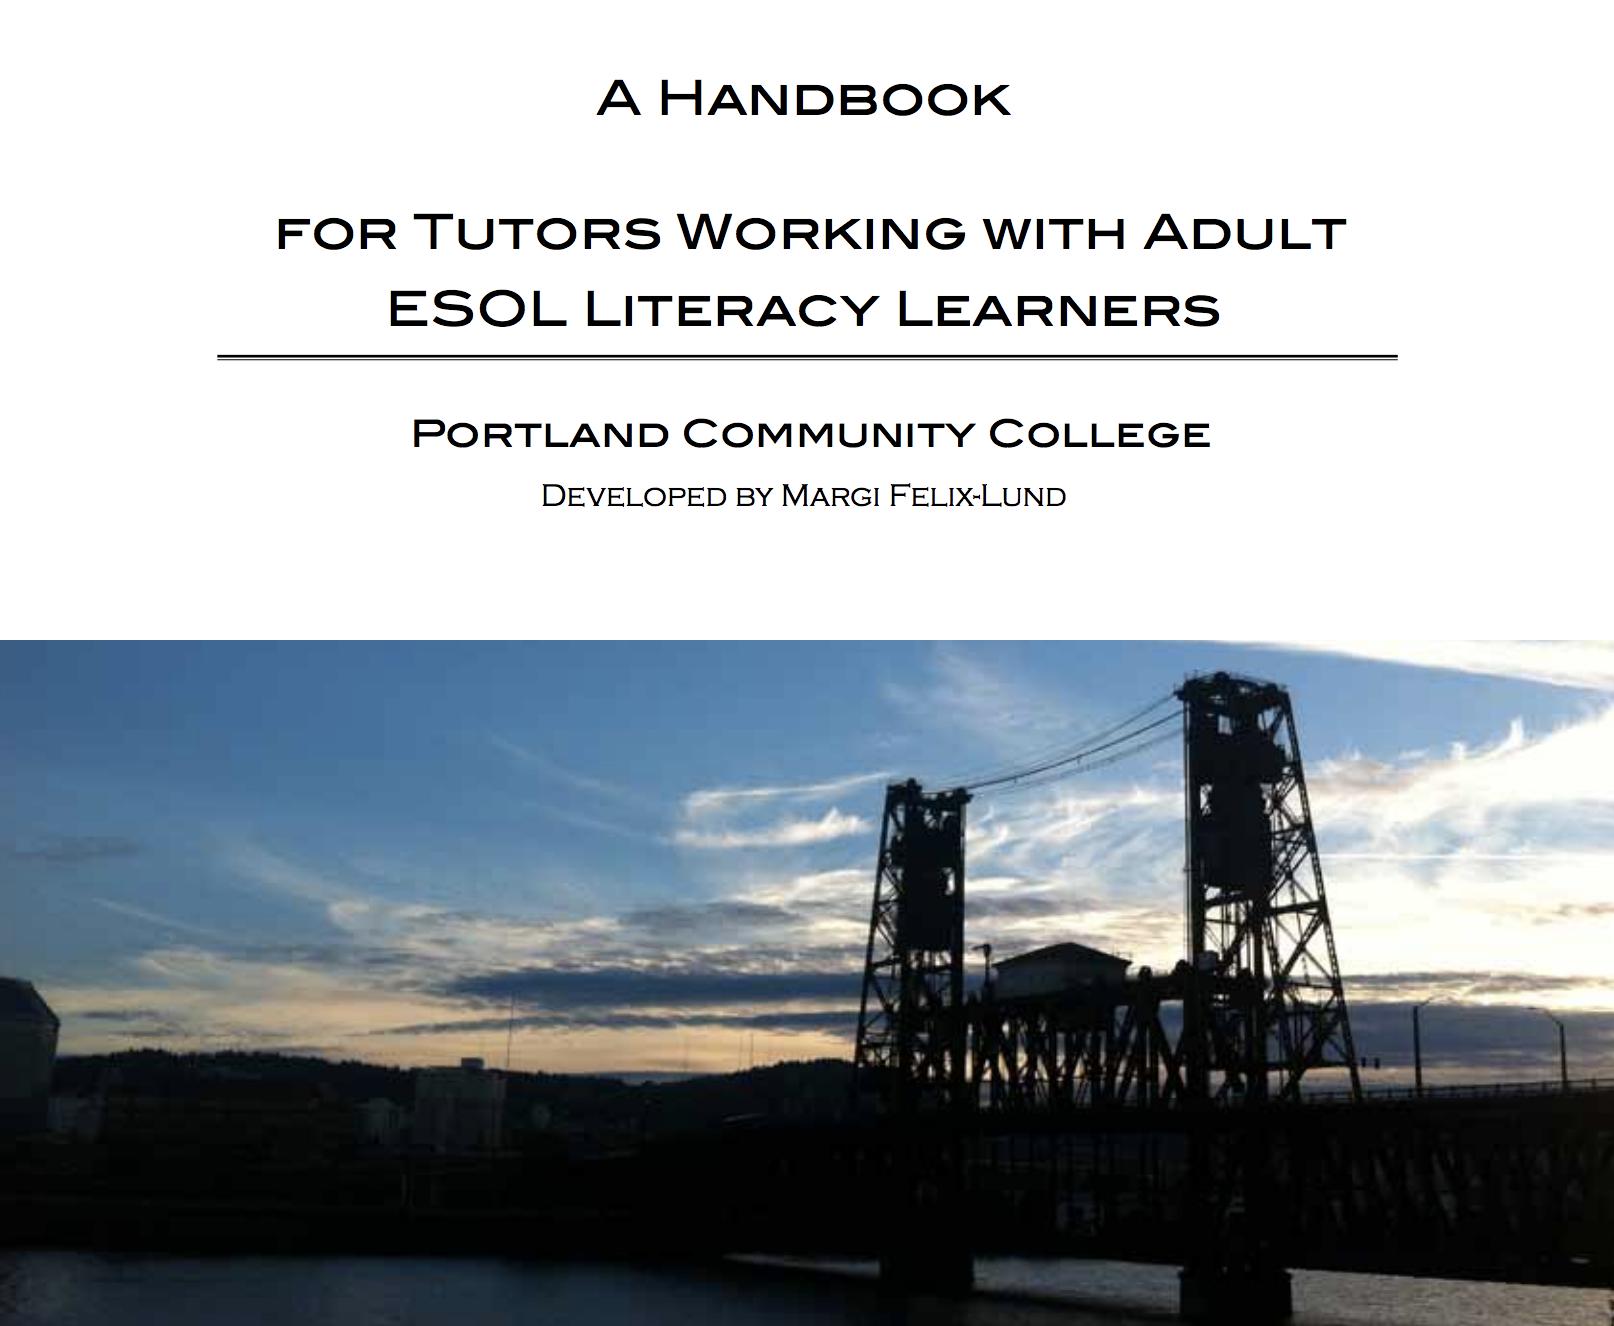 Felix-Lund Handbook cover.png